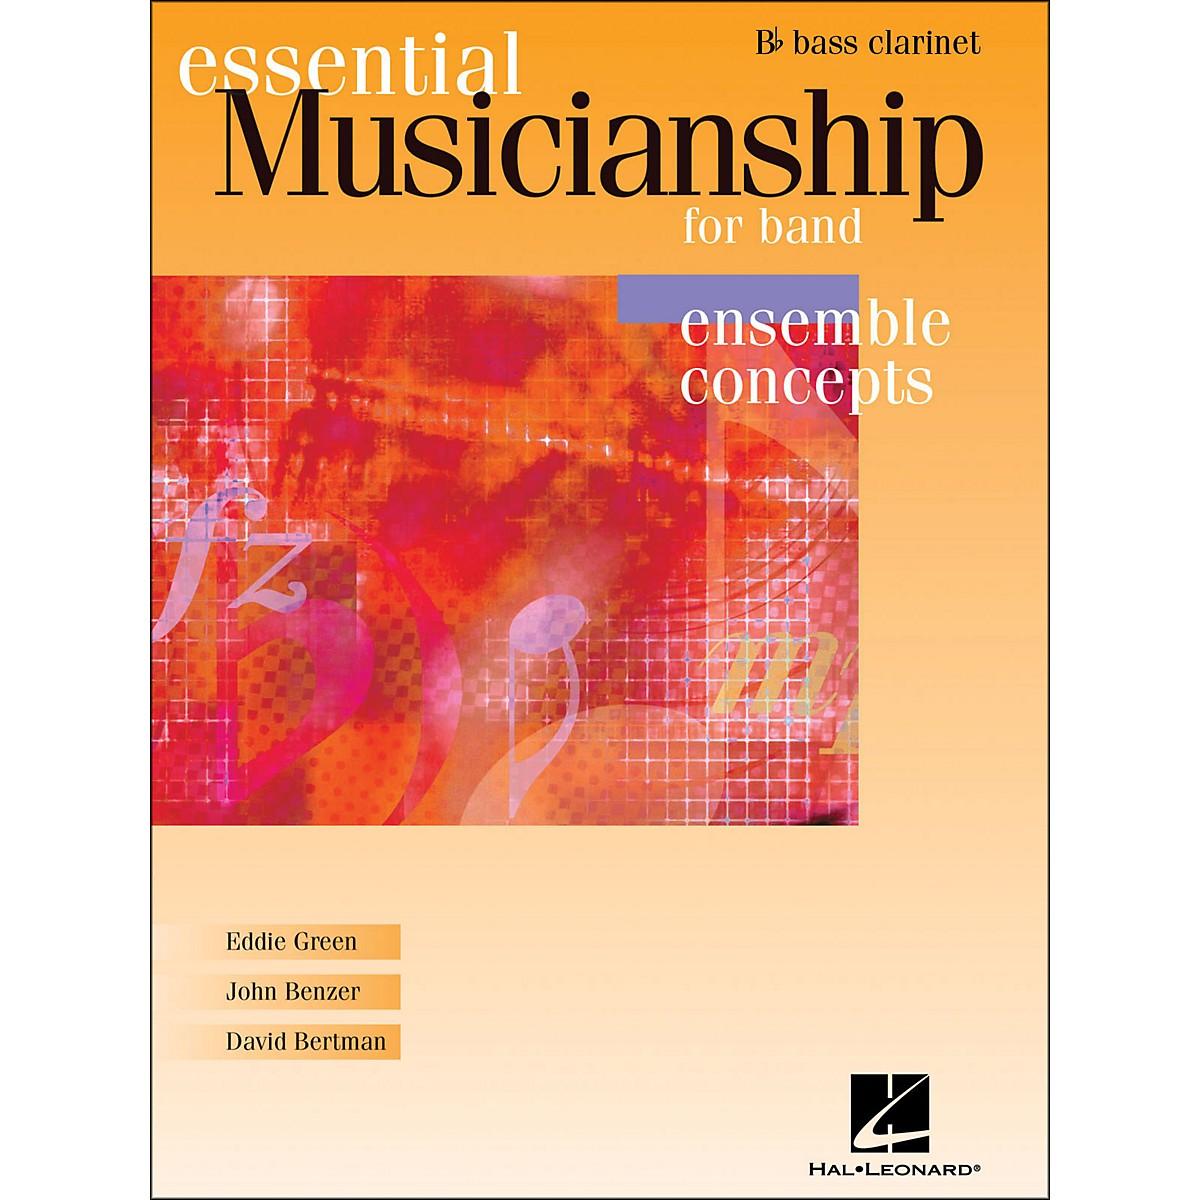 Hal Leonard Essential Musicianship for Band - Ensemble Concepts Bass Clarinet